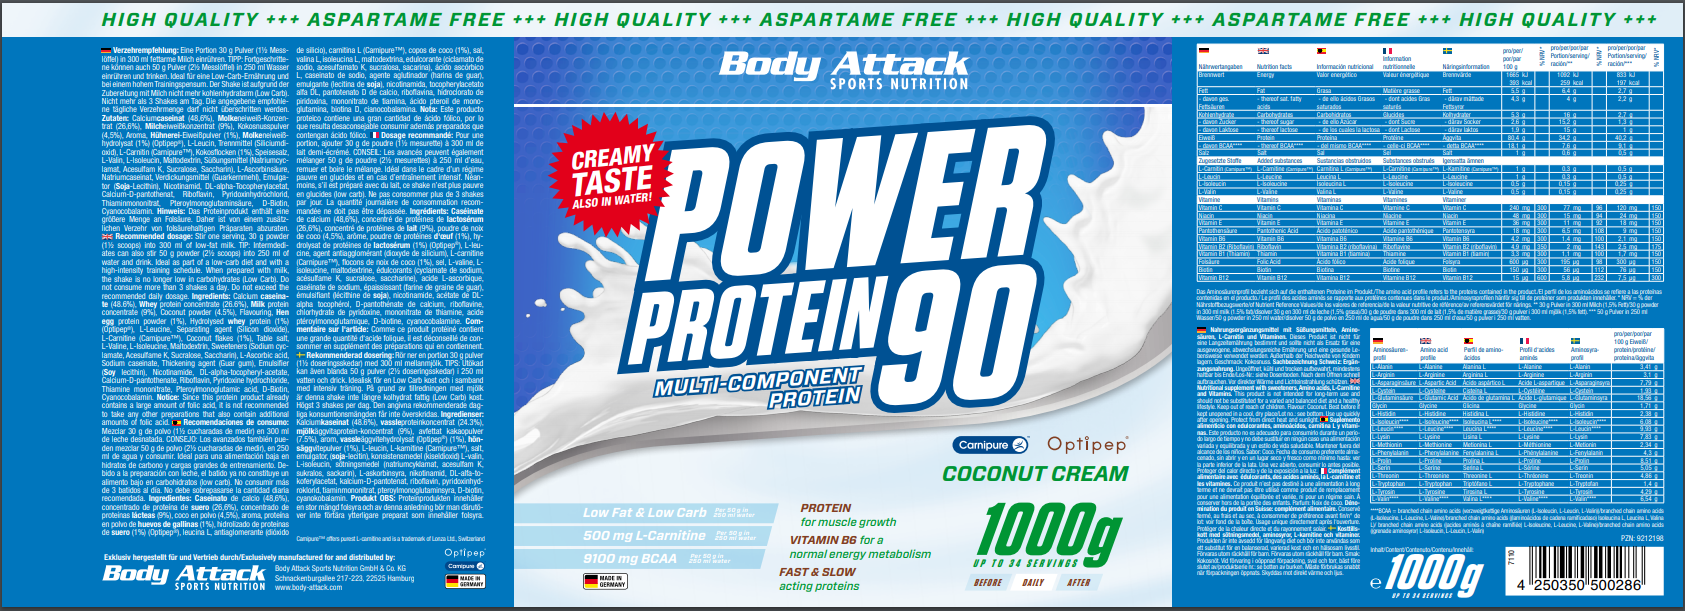 Power Proti 90 Coconut